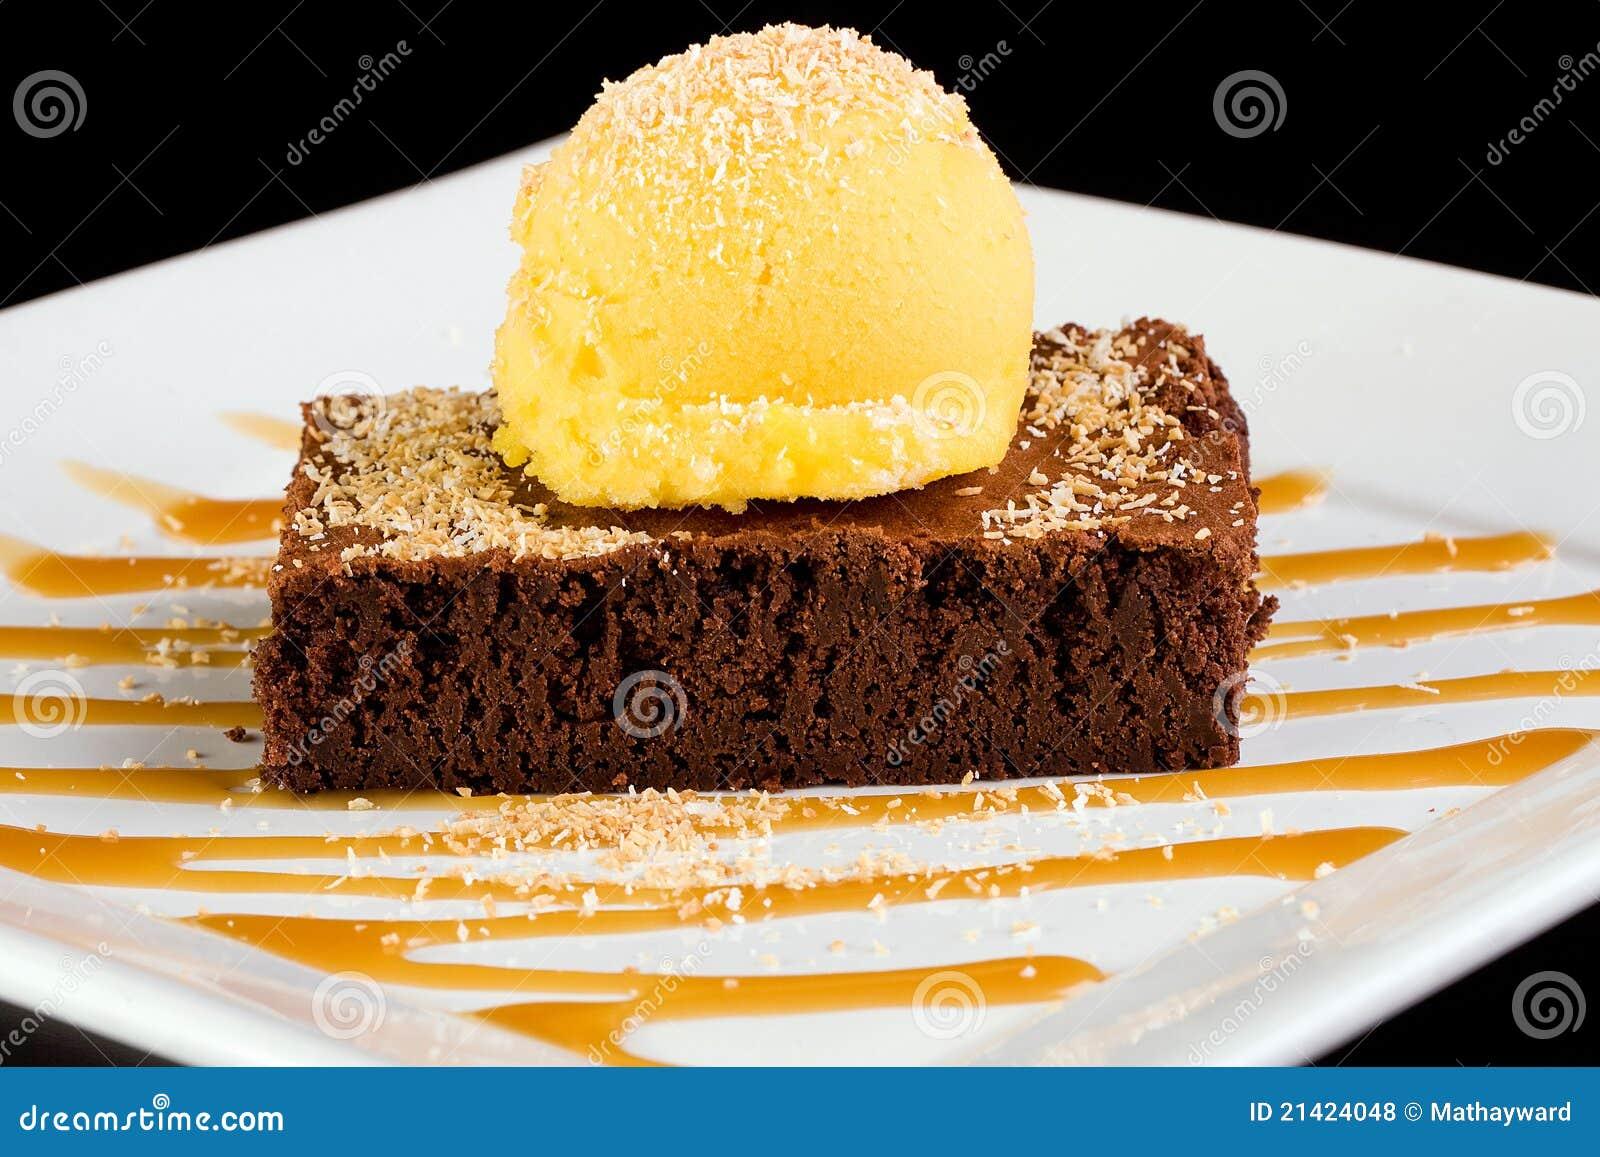 flourless, gluten free chocolate torte topped wtih fresh mango sorbet ...